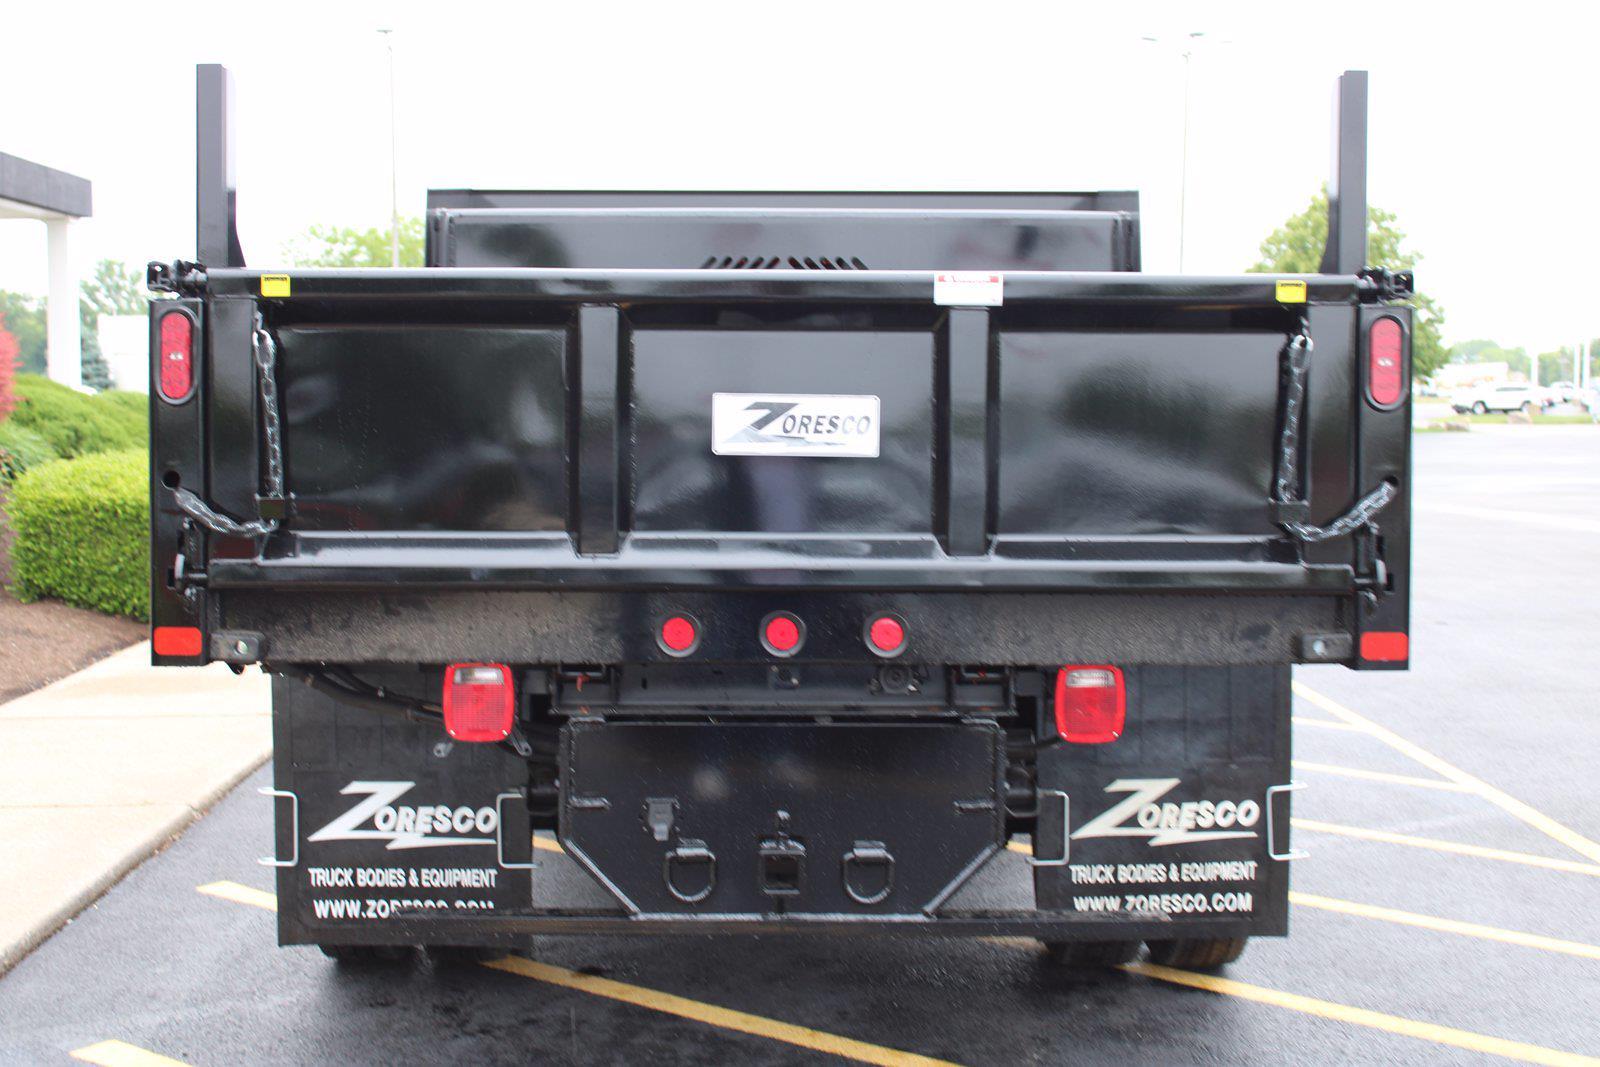 2021 GMC Sierra 3500 Regular Cab 4x4, Dump Body #P21-1003 - photo 5